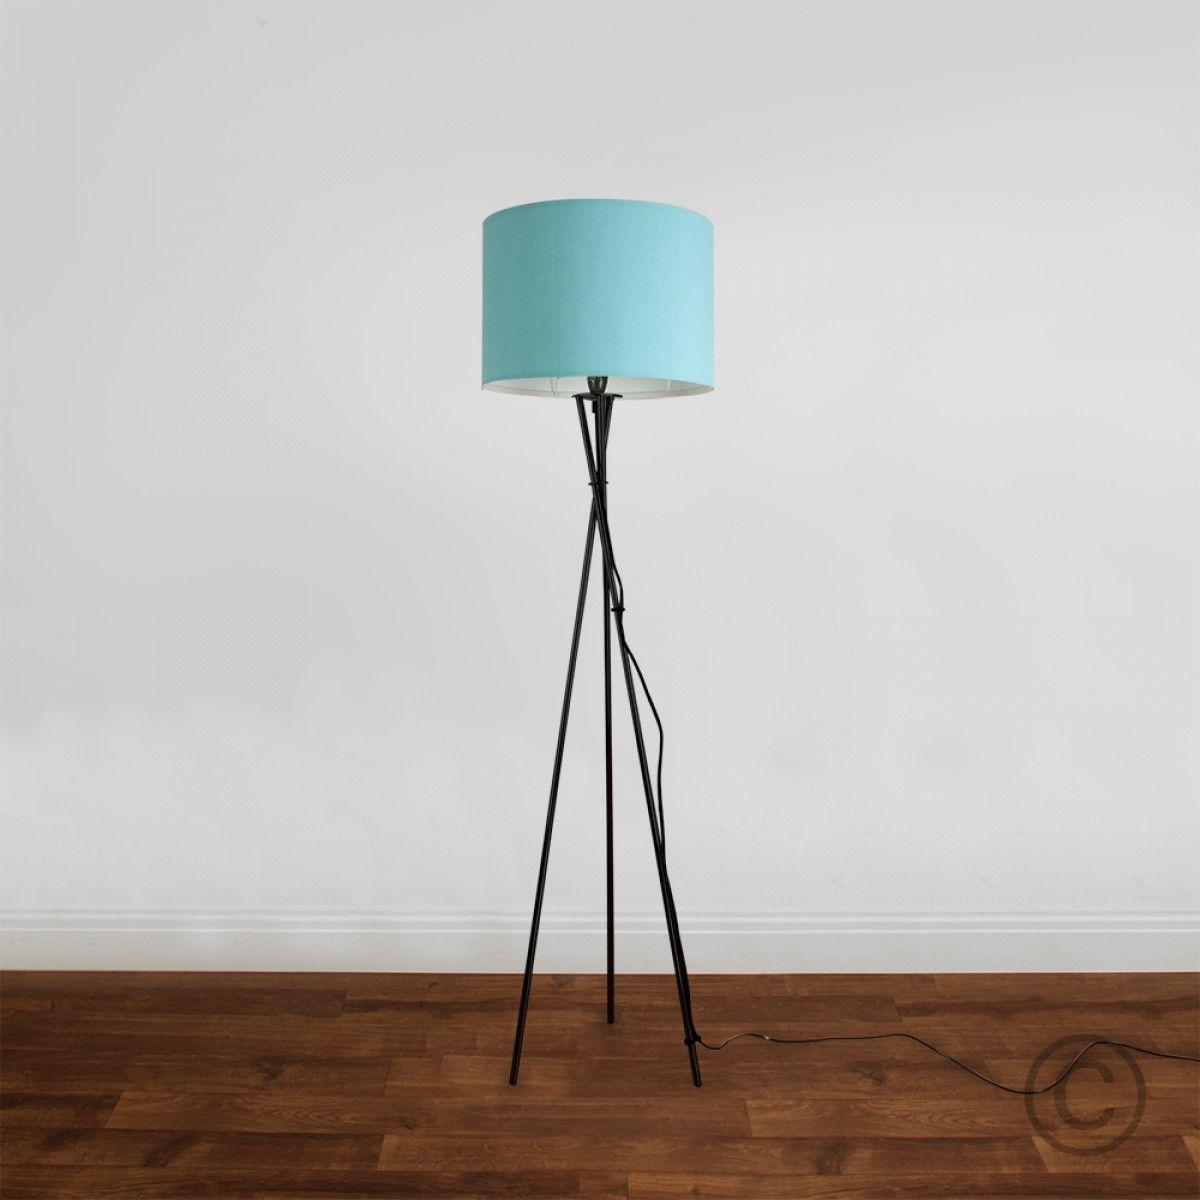 Camden Tripod Floor Lamp in Black, Duck Egg Blue Fabric